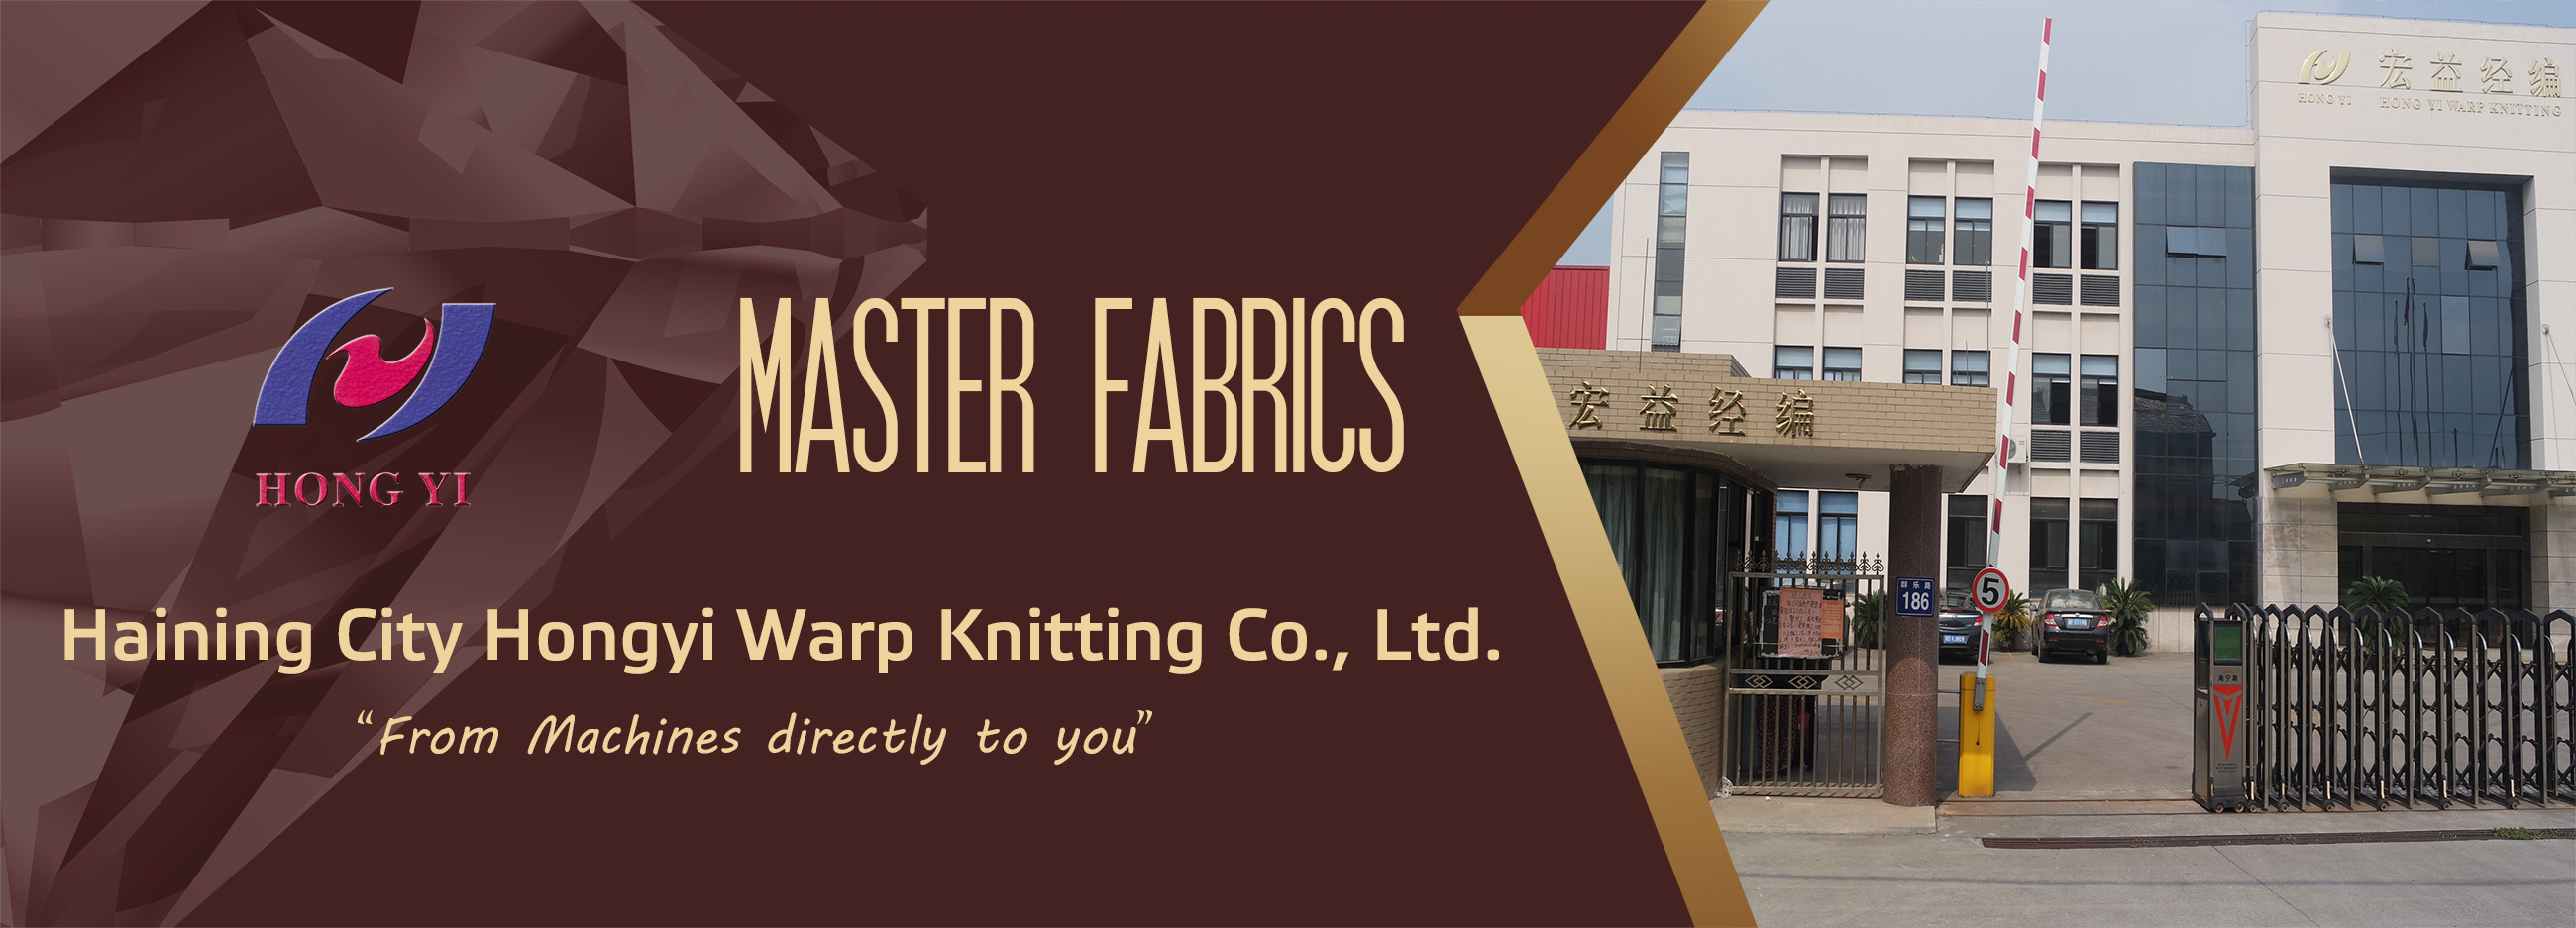 Haining City Hongyi Warp Knitting Co., Ltd. Main Image